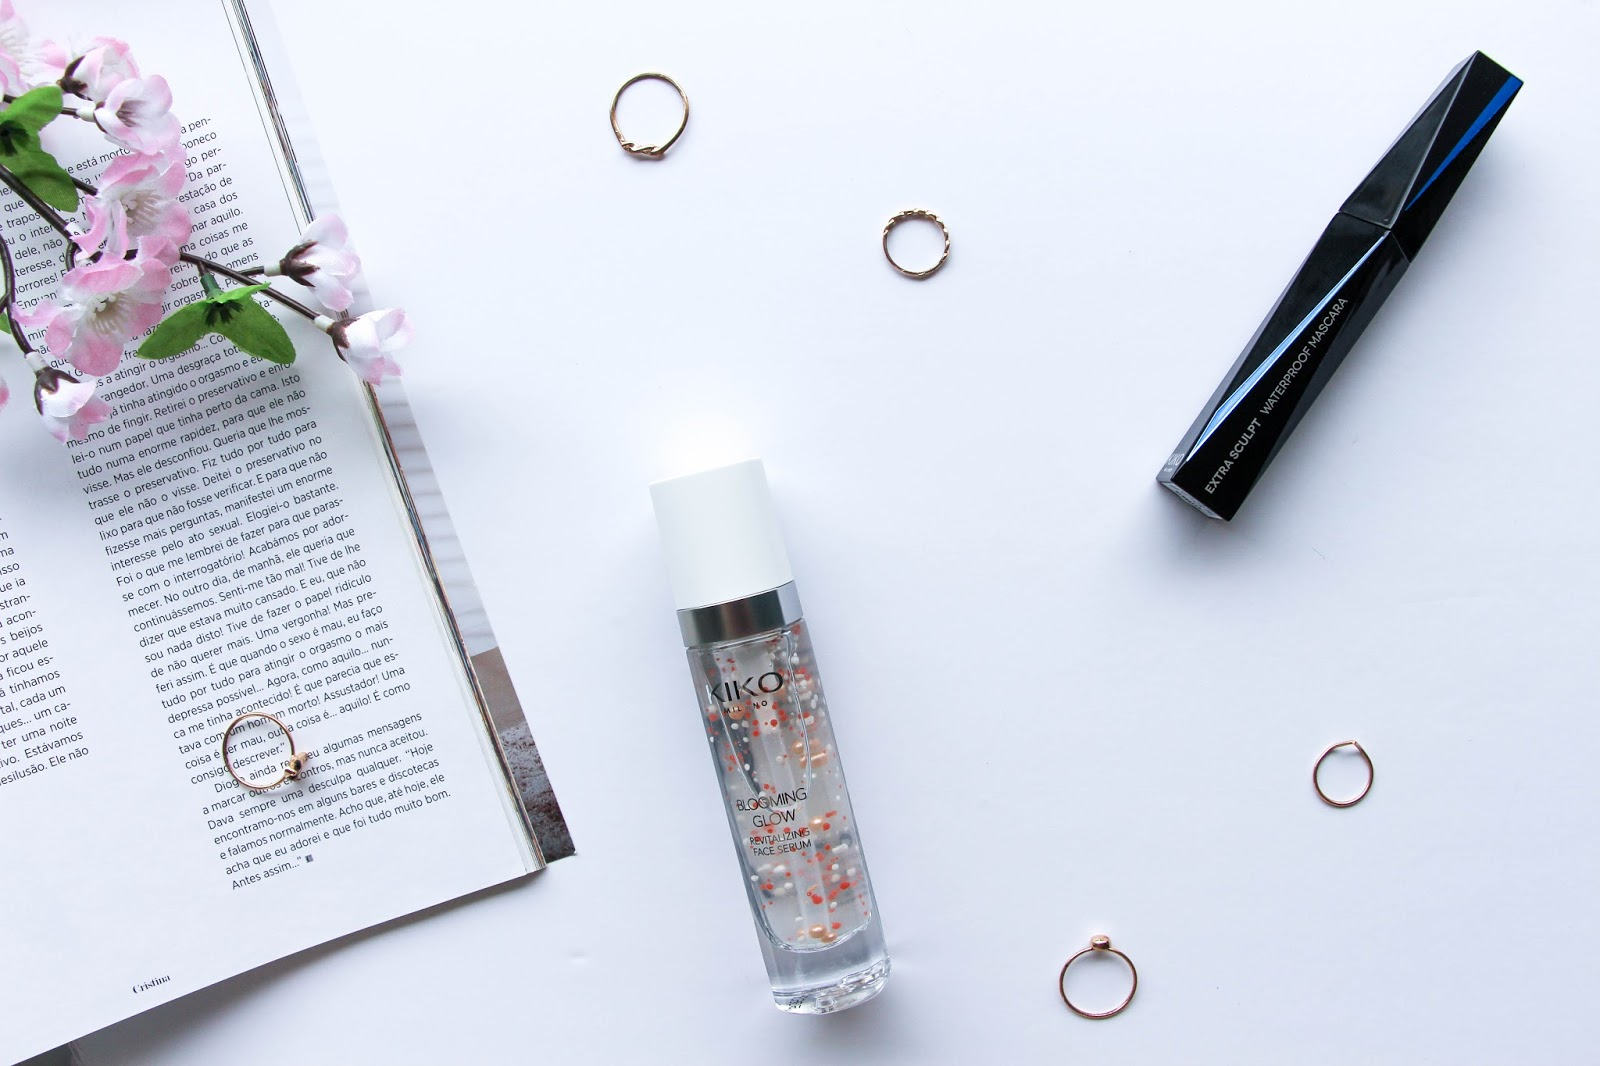 Kiko Milano Makeup